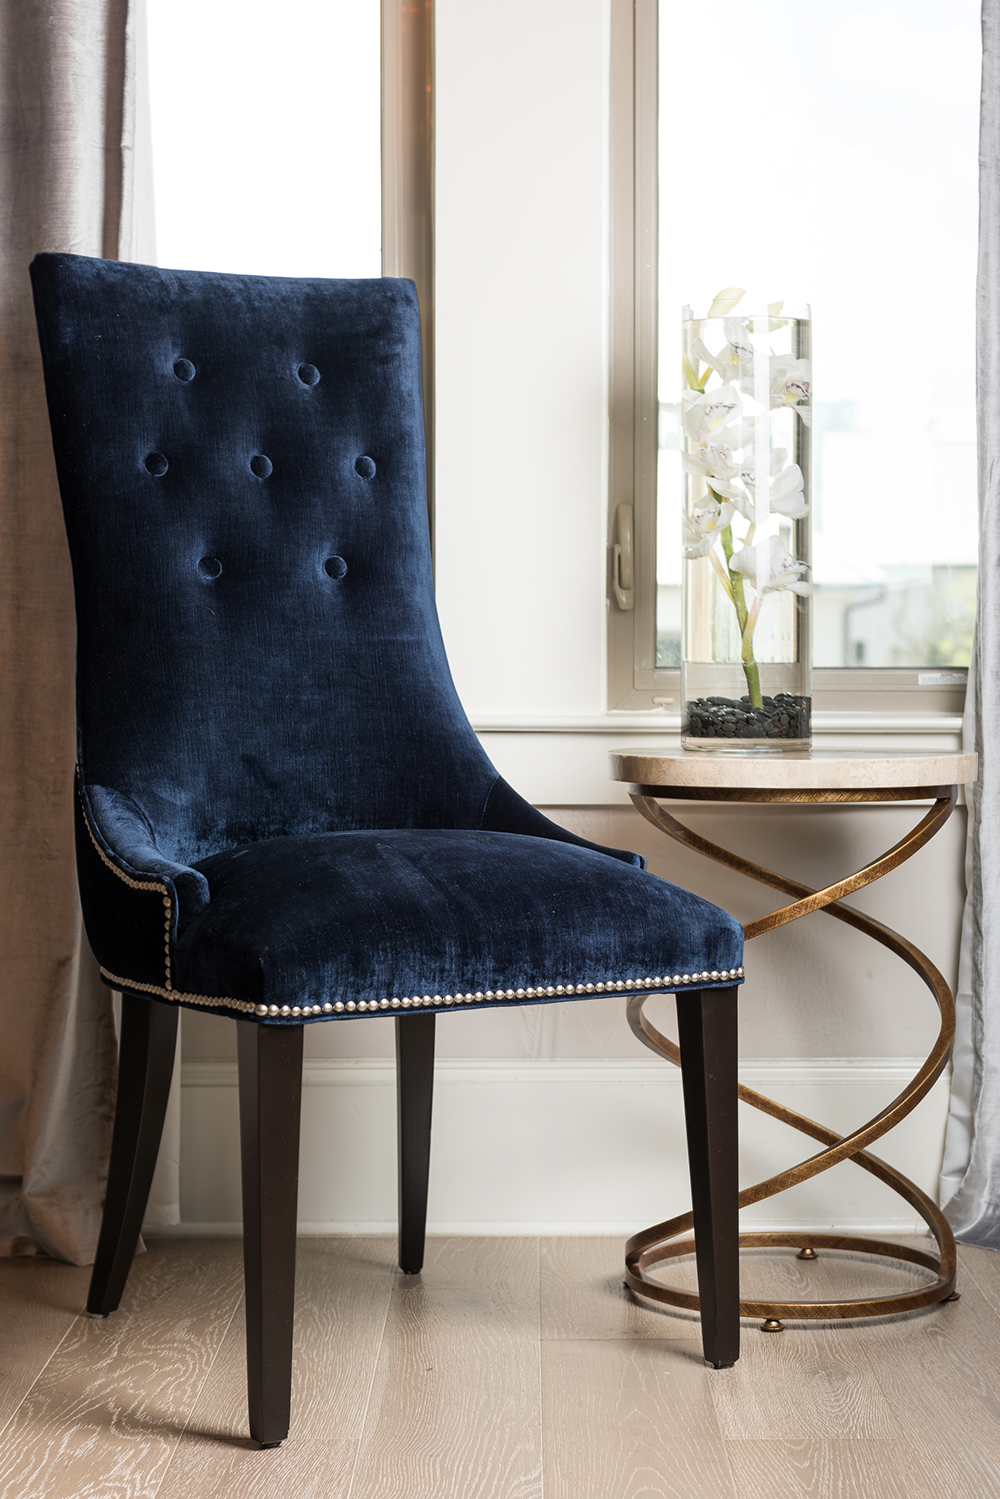 custom design chair